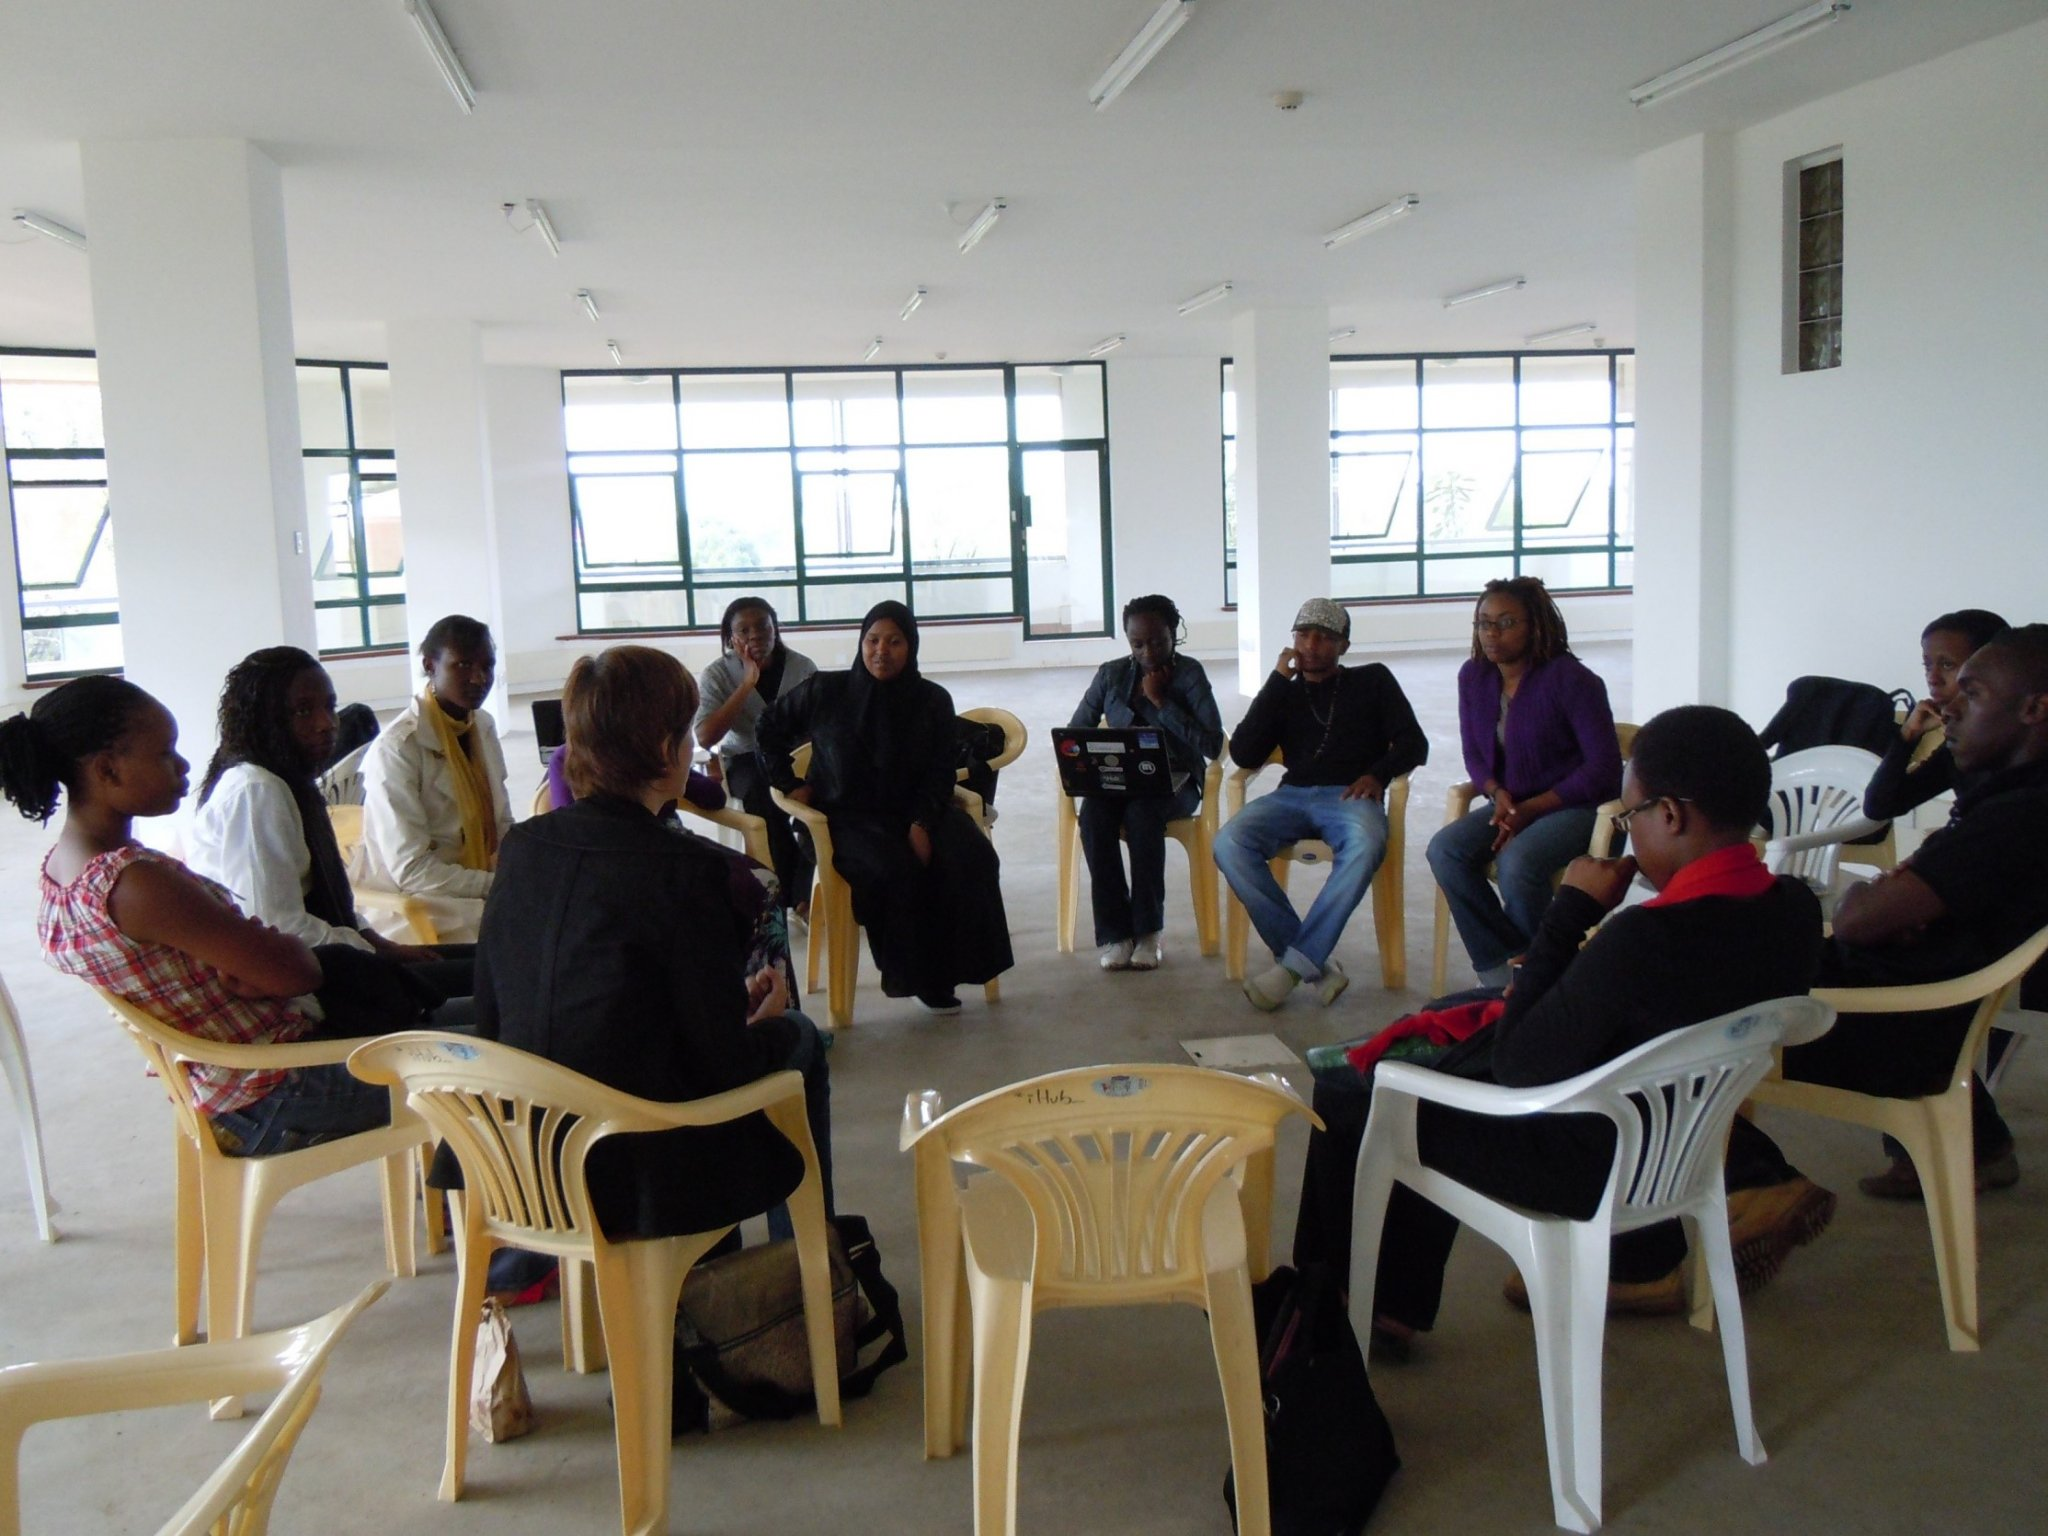 Kenyan app developers brainstorming ideas for new apps